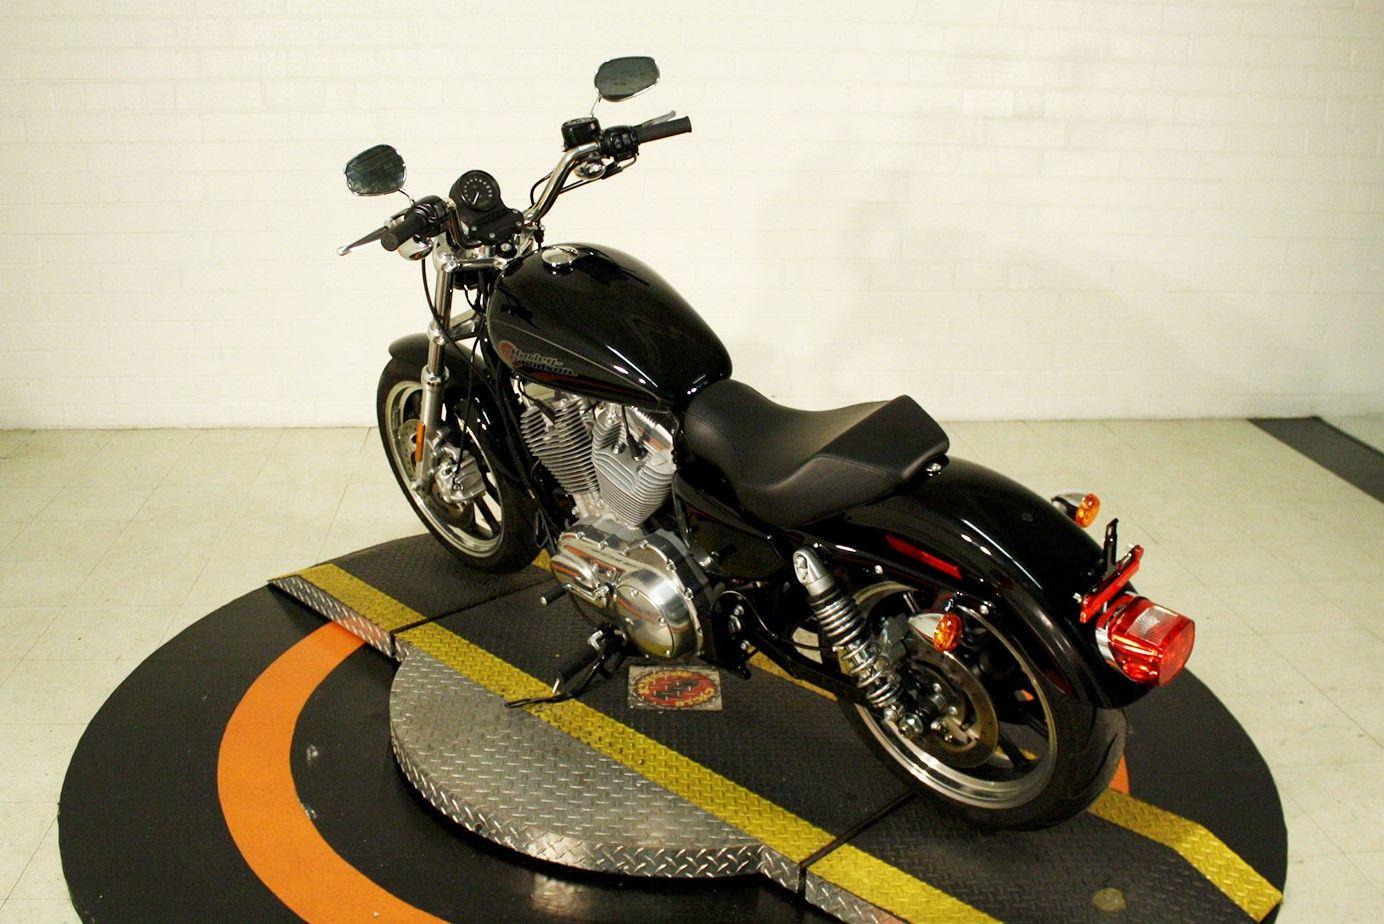 Pre-Owned 2019 Harley-Davidson SuperLow